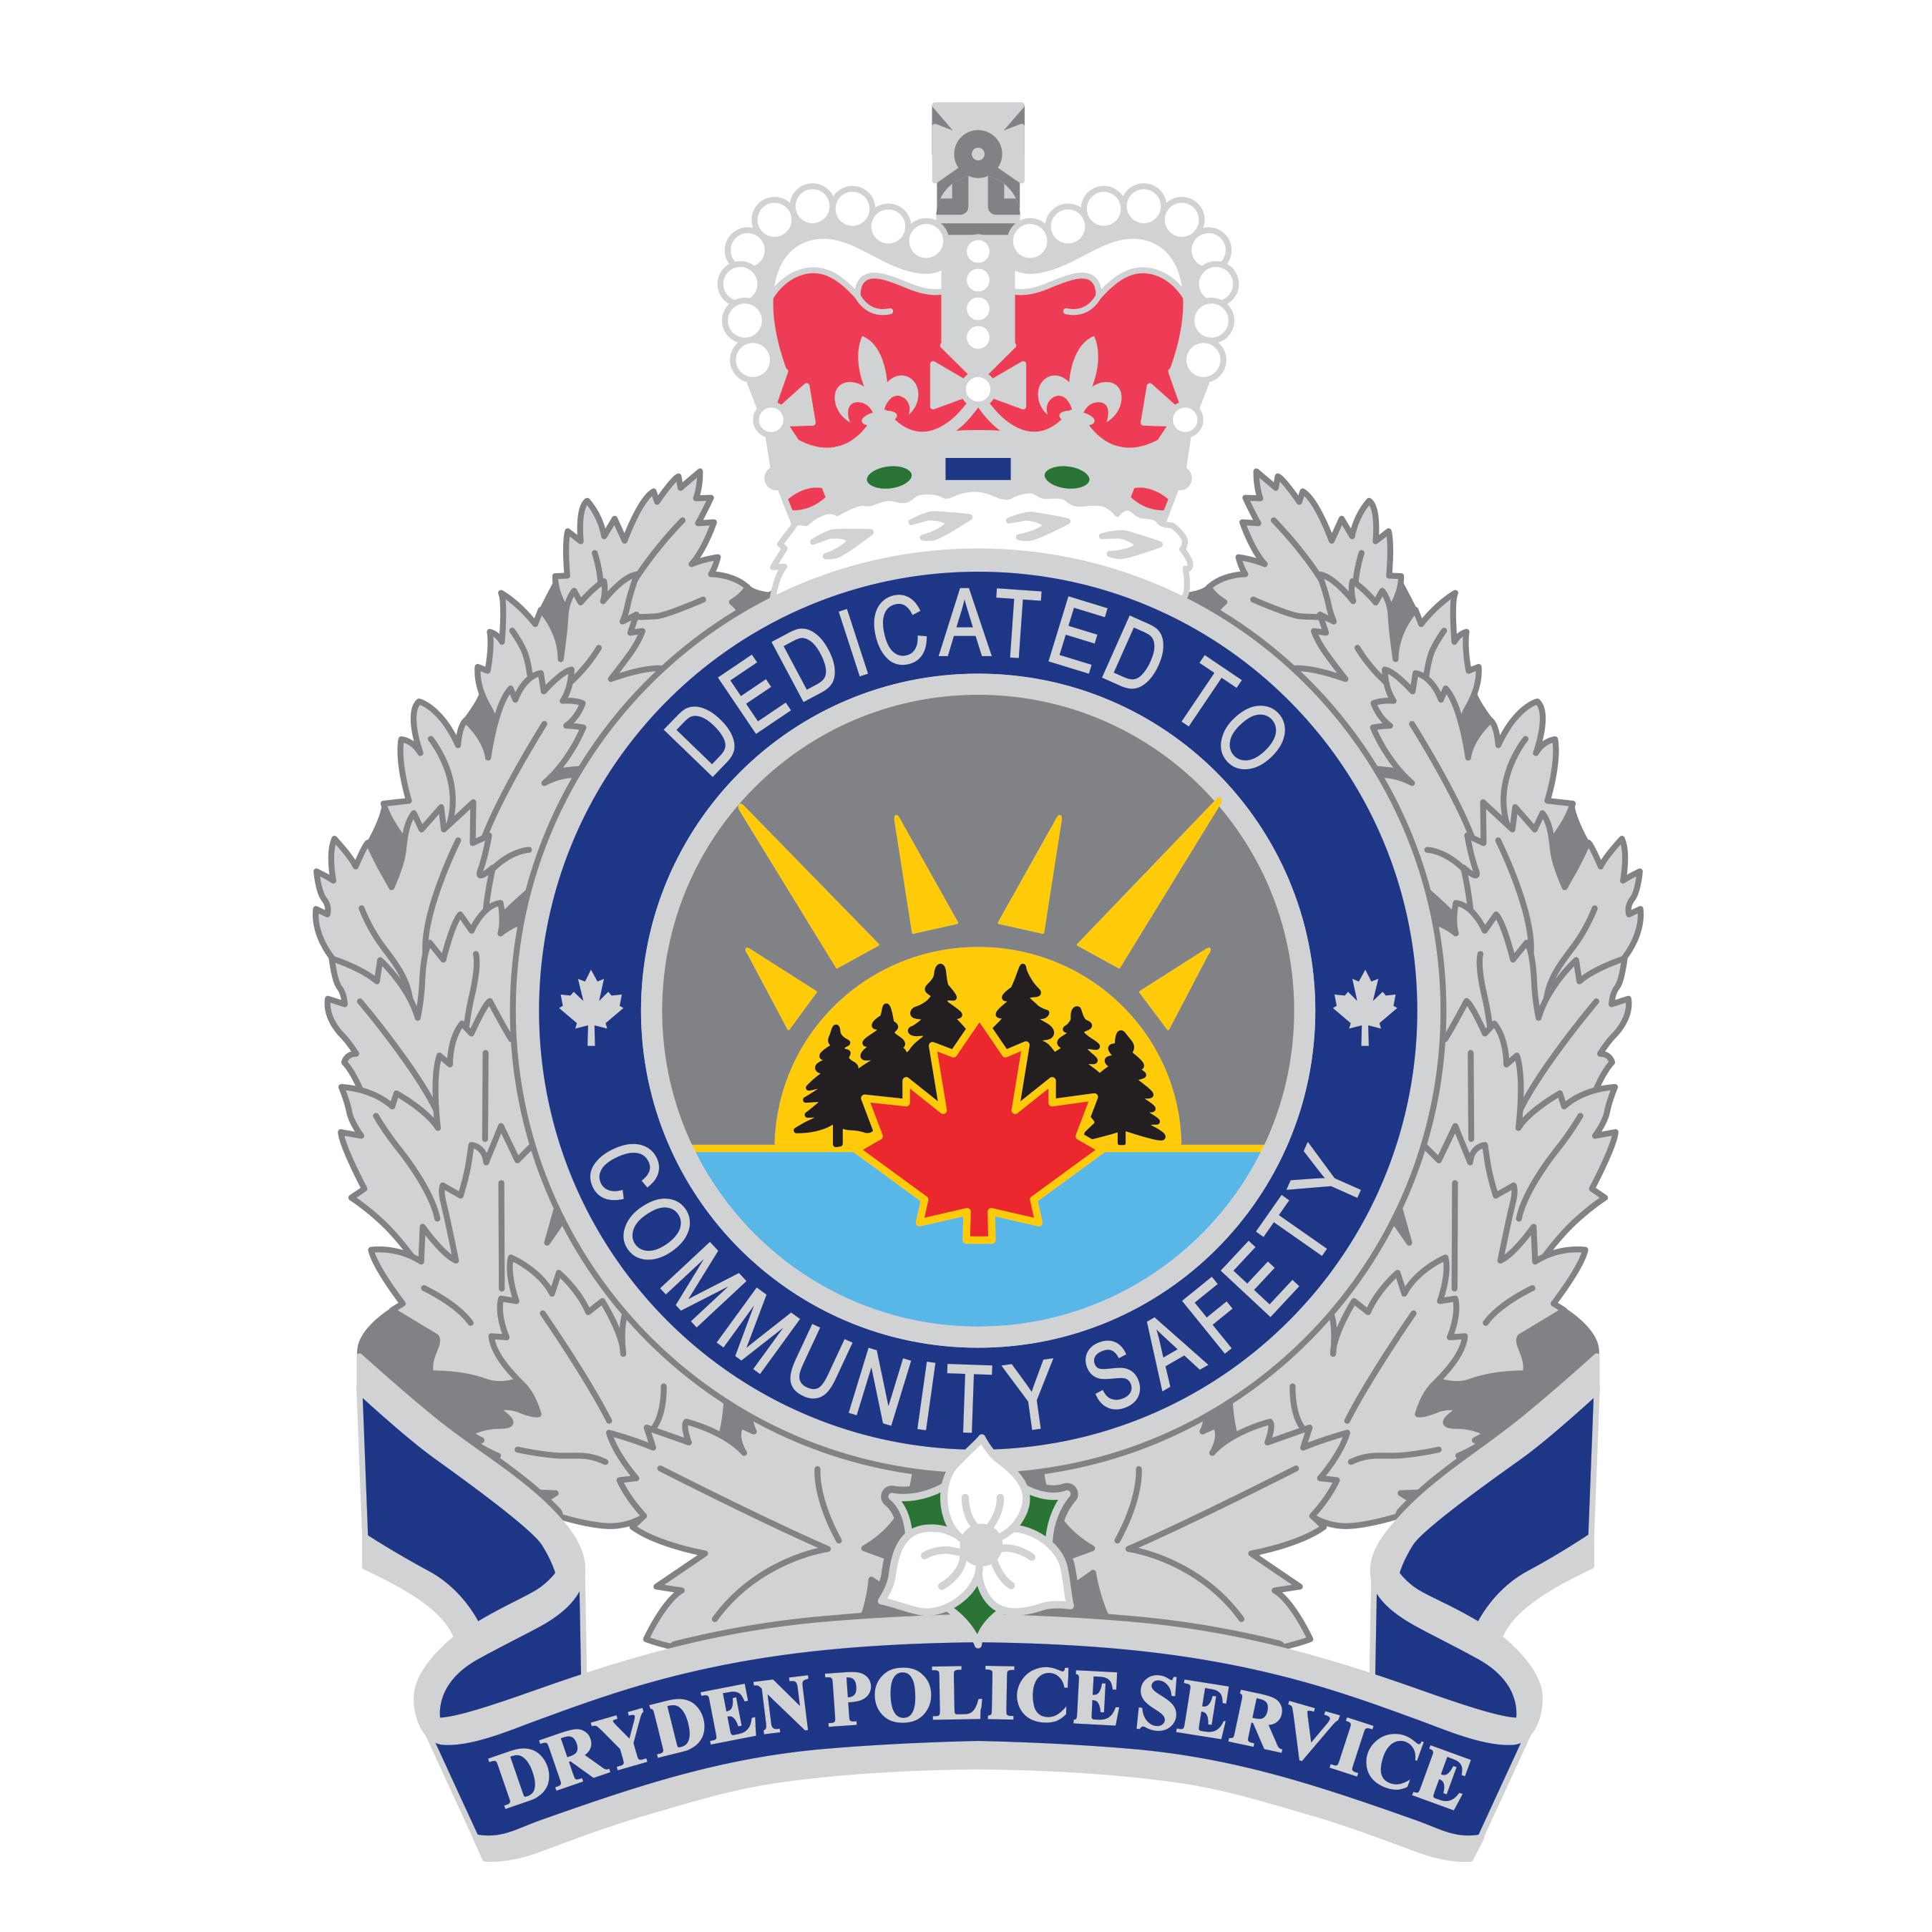 Dryden Police Servicv